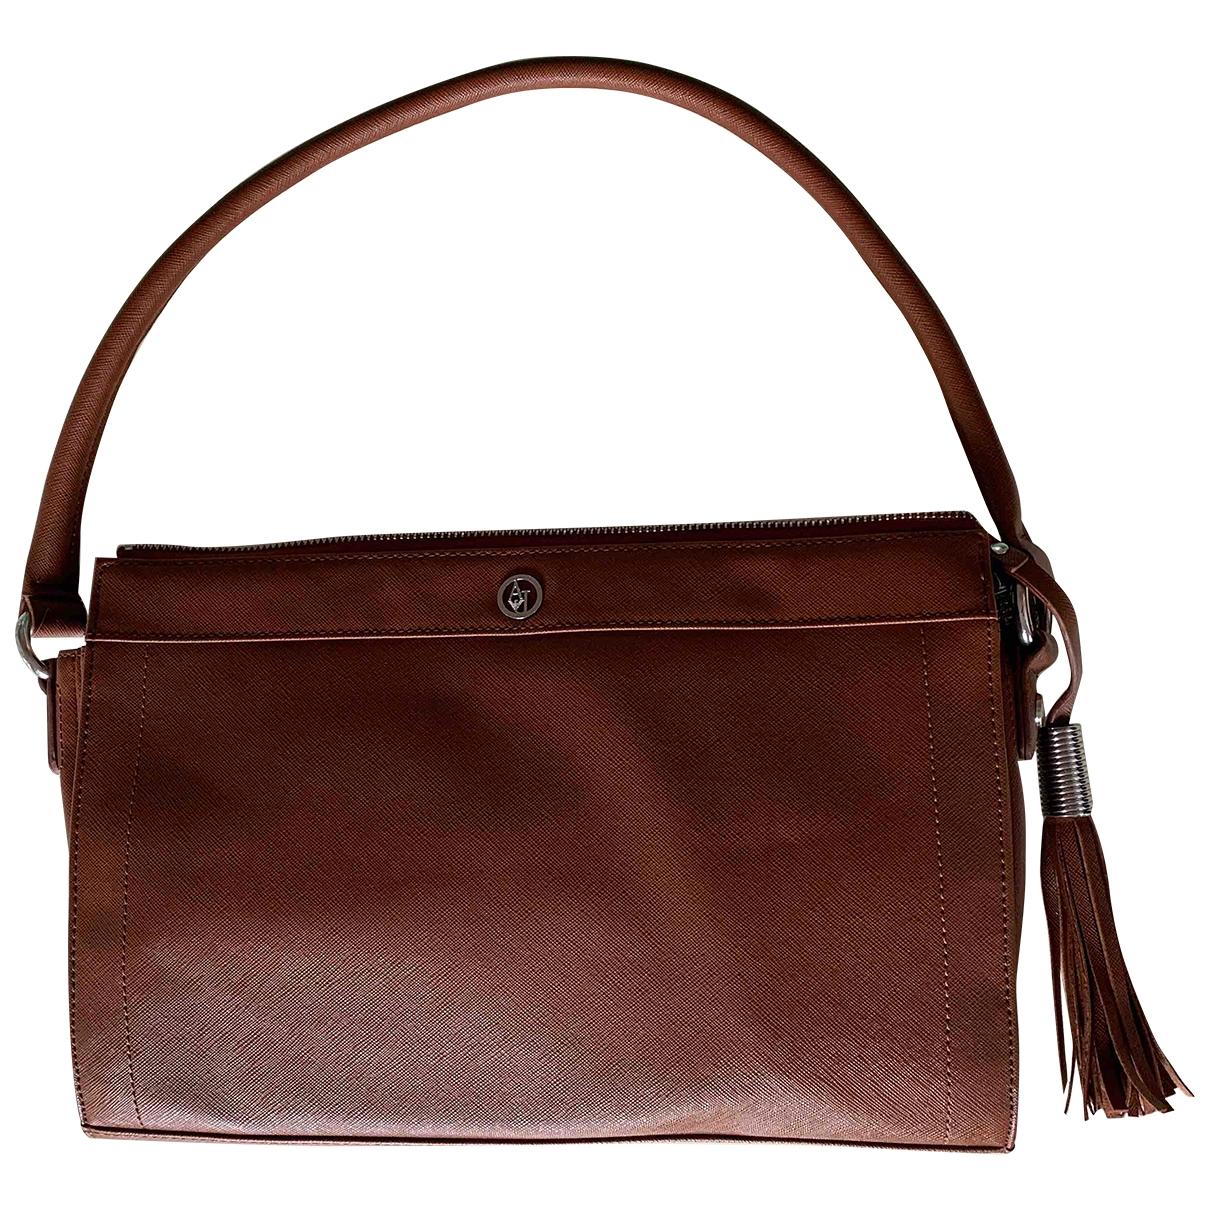 Armani Jeans \N Brown handbag for Women \N